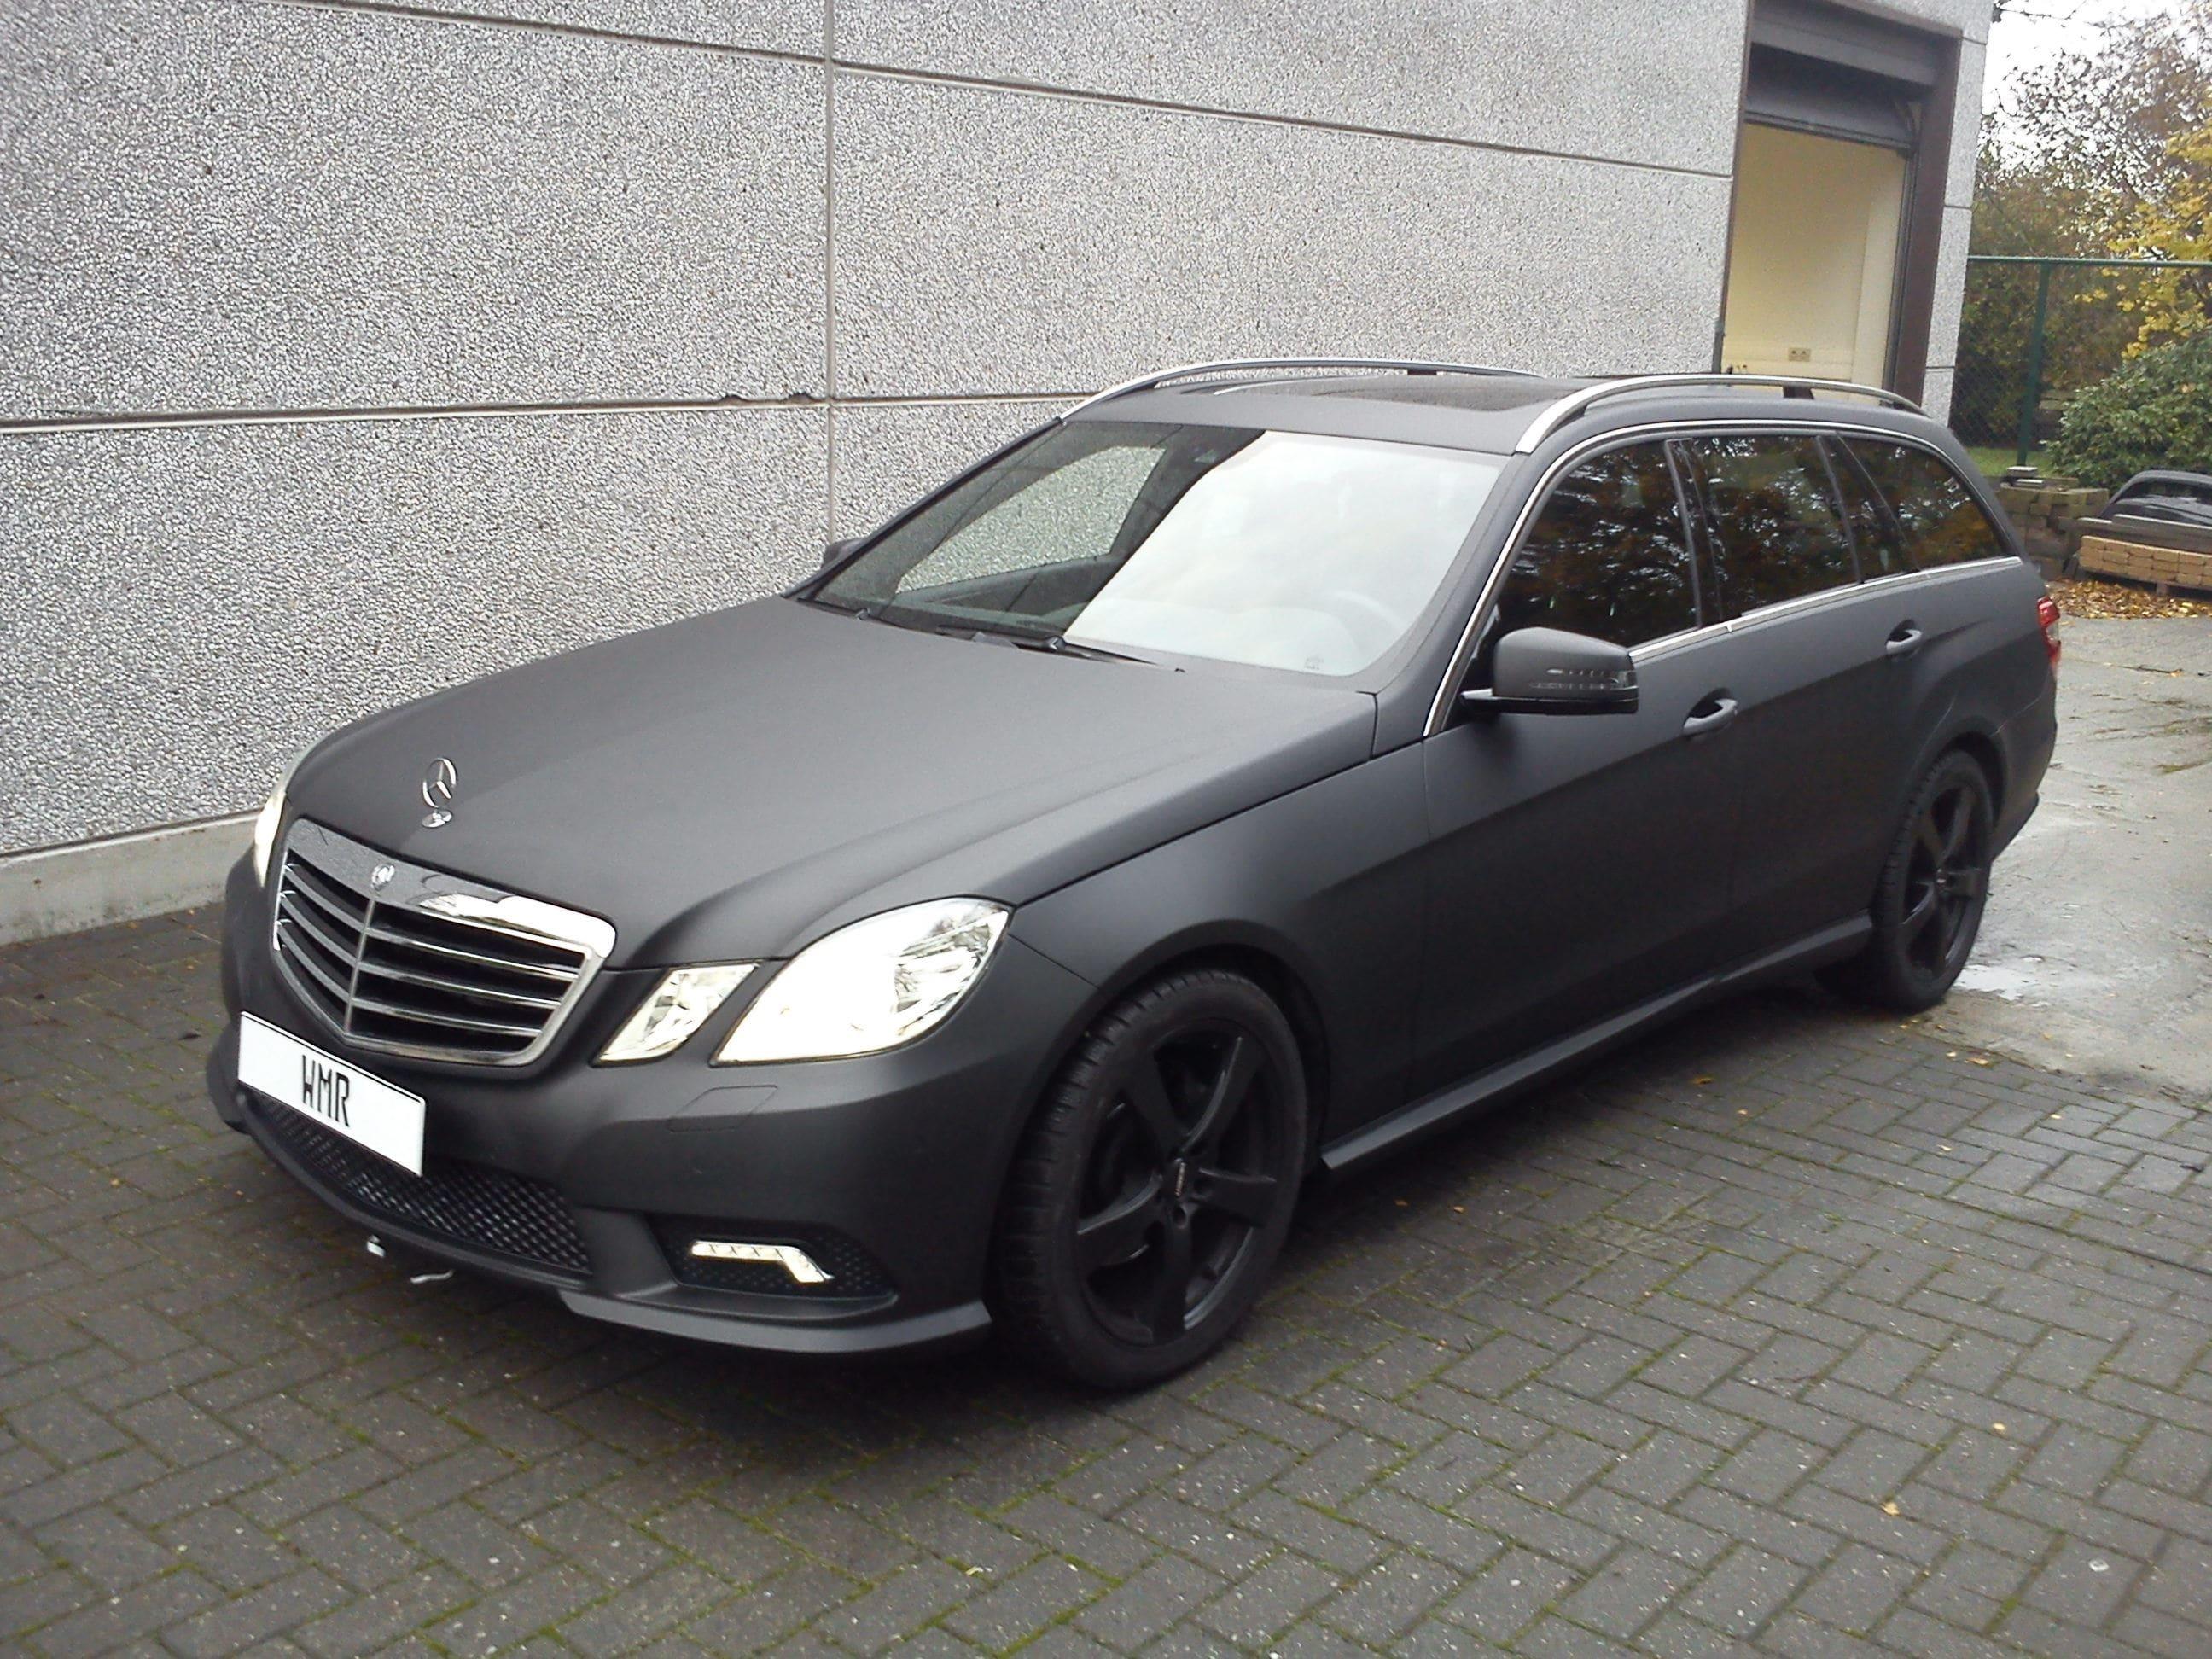 Mercedes E320 met Mat Zwarte Wrap, Carwrapping door Wrapmyride.nu Foto-nr:6227, ©2020